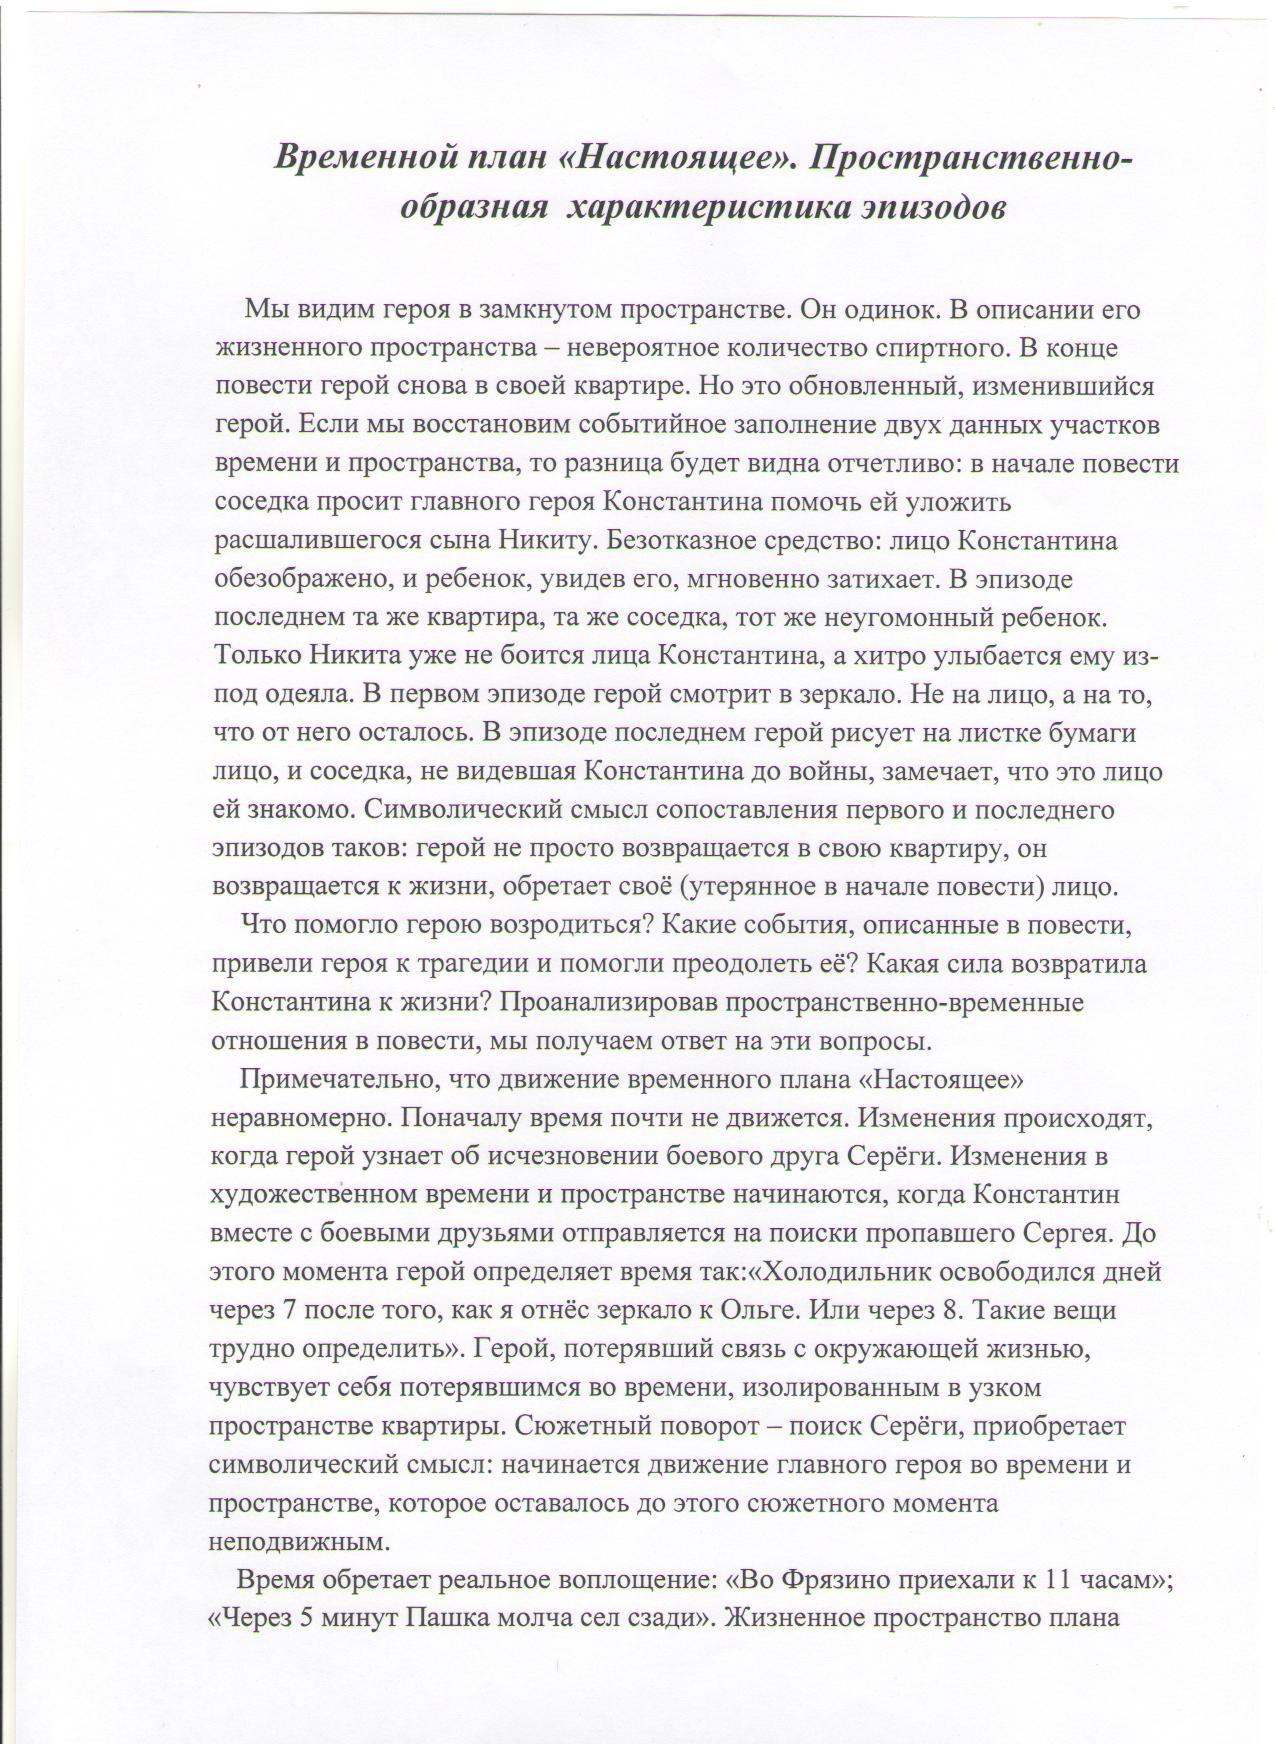 C:\Documents and Settings\Иван\Рабочий стол\gtlcjdtn\изображение 005.jpg